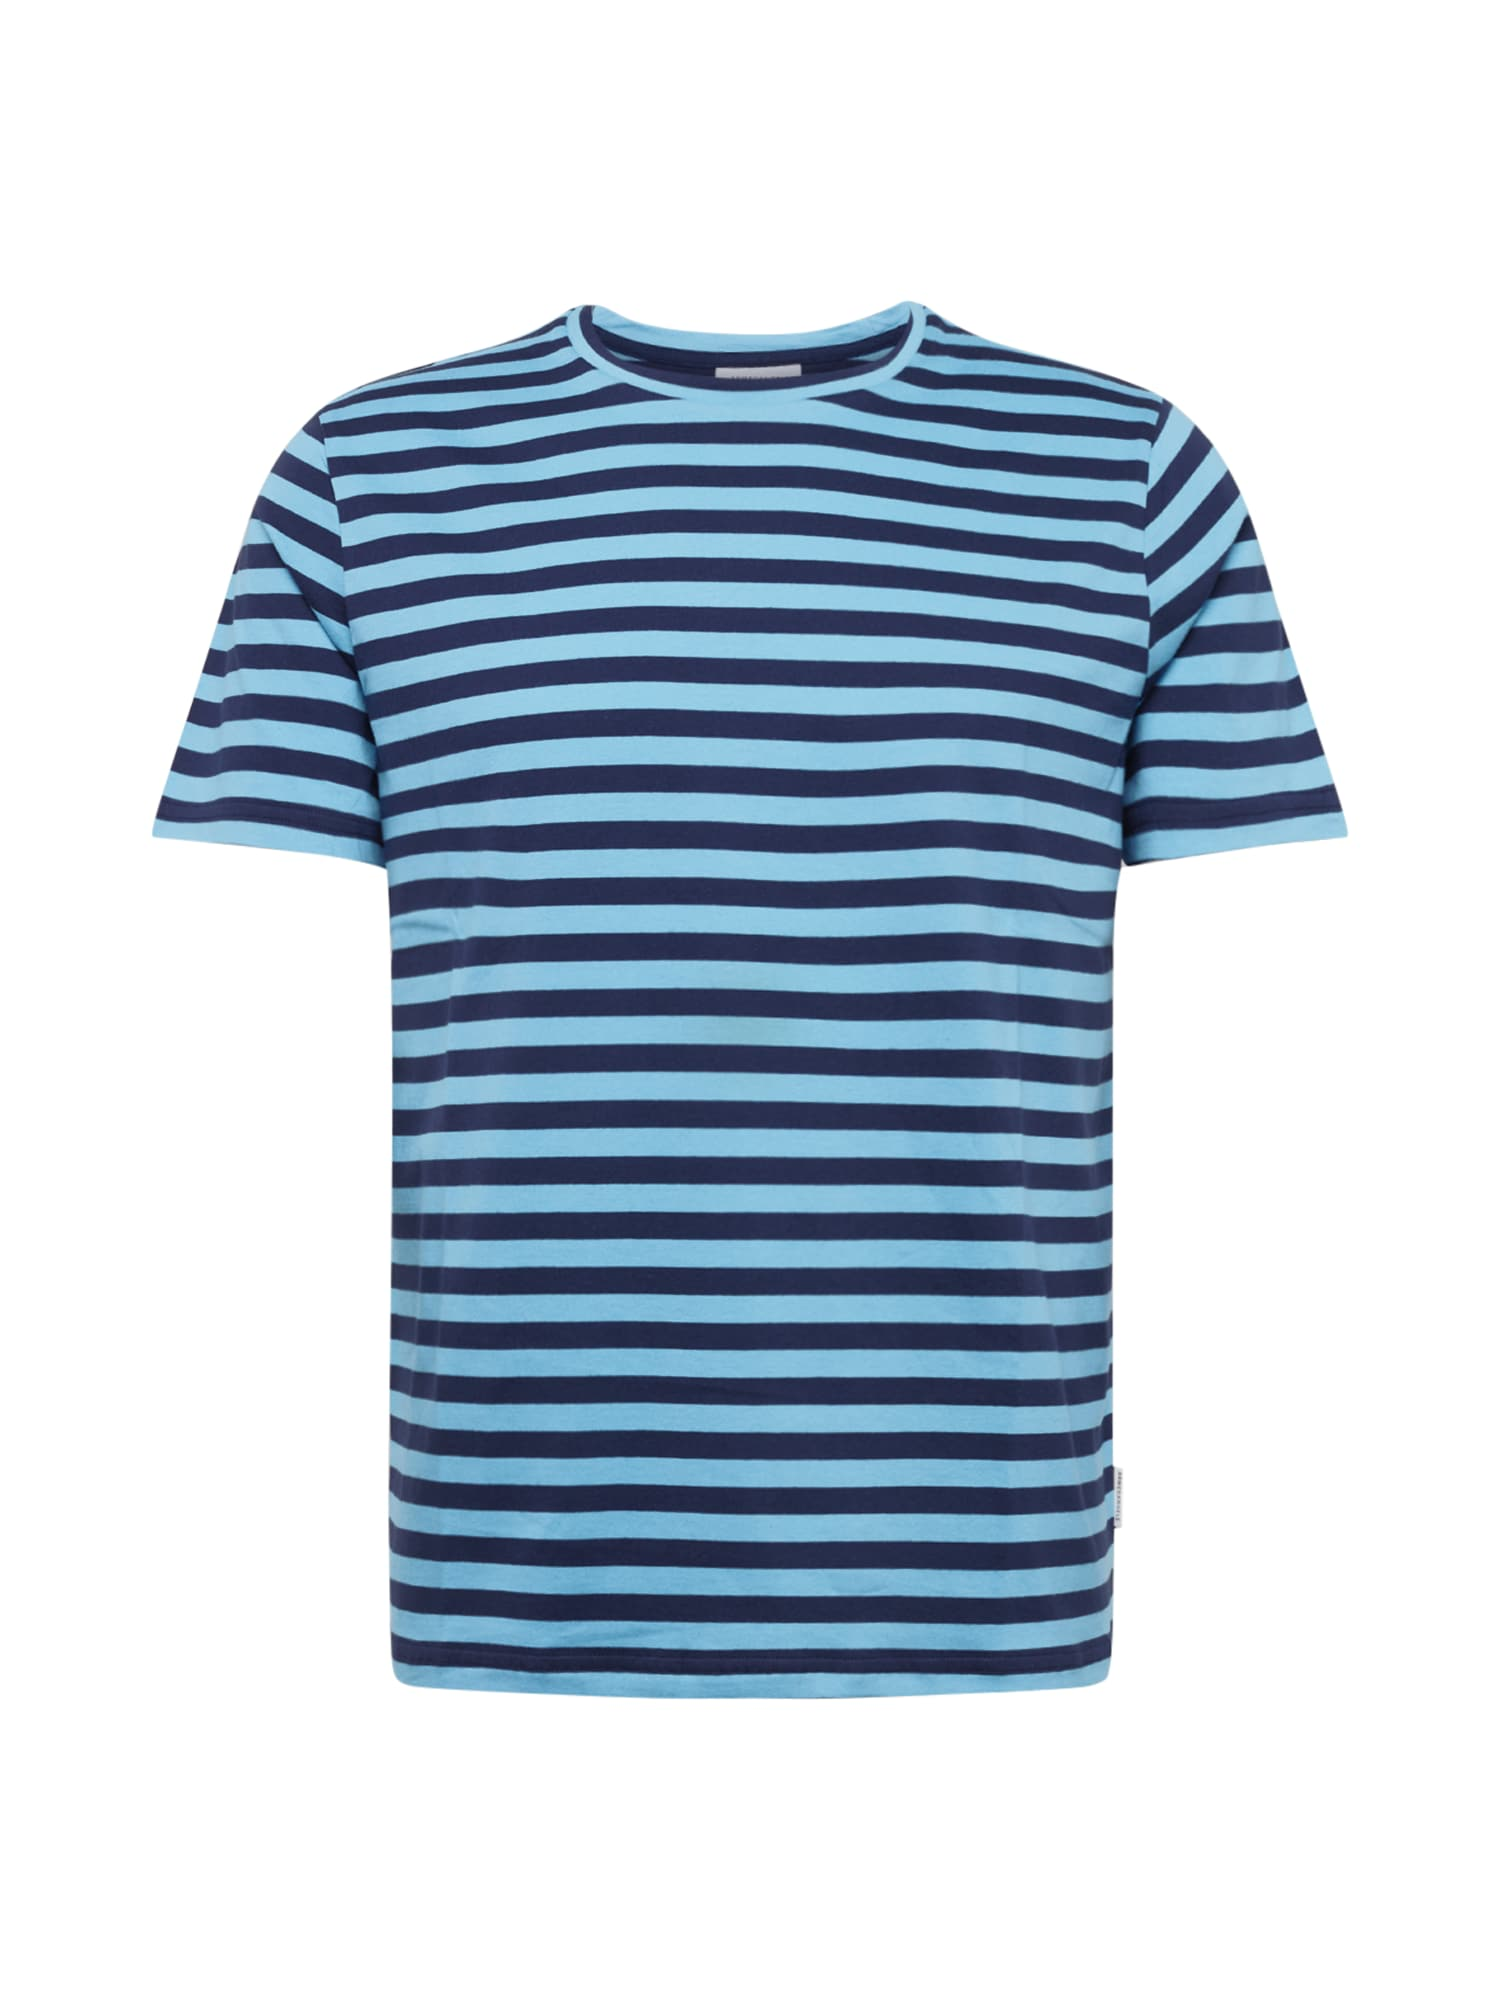 ARMEDANGELS Marškinėliai 'JAAMES BRETON' mėlyna / tamsiai mėlyna